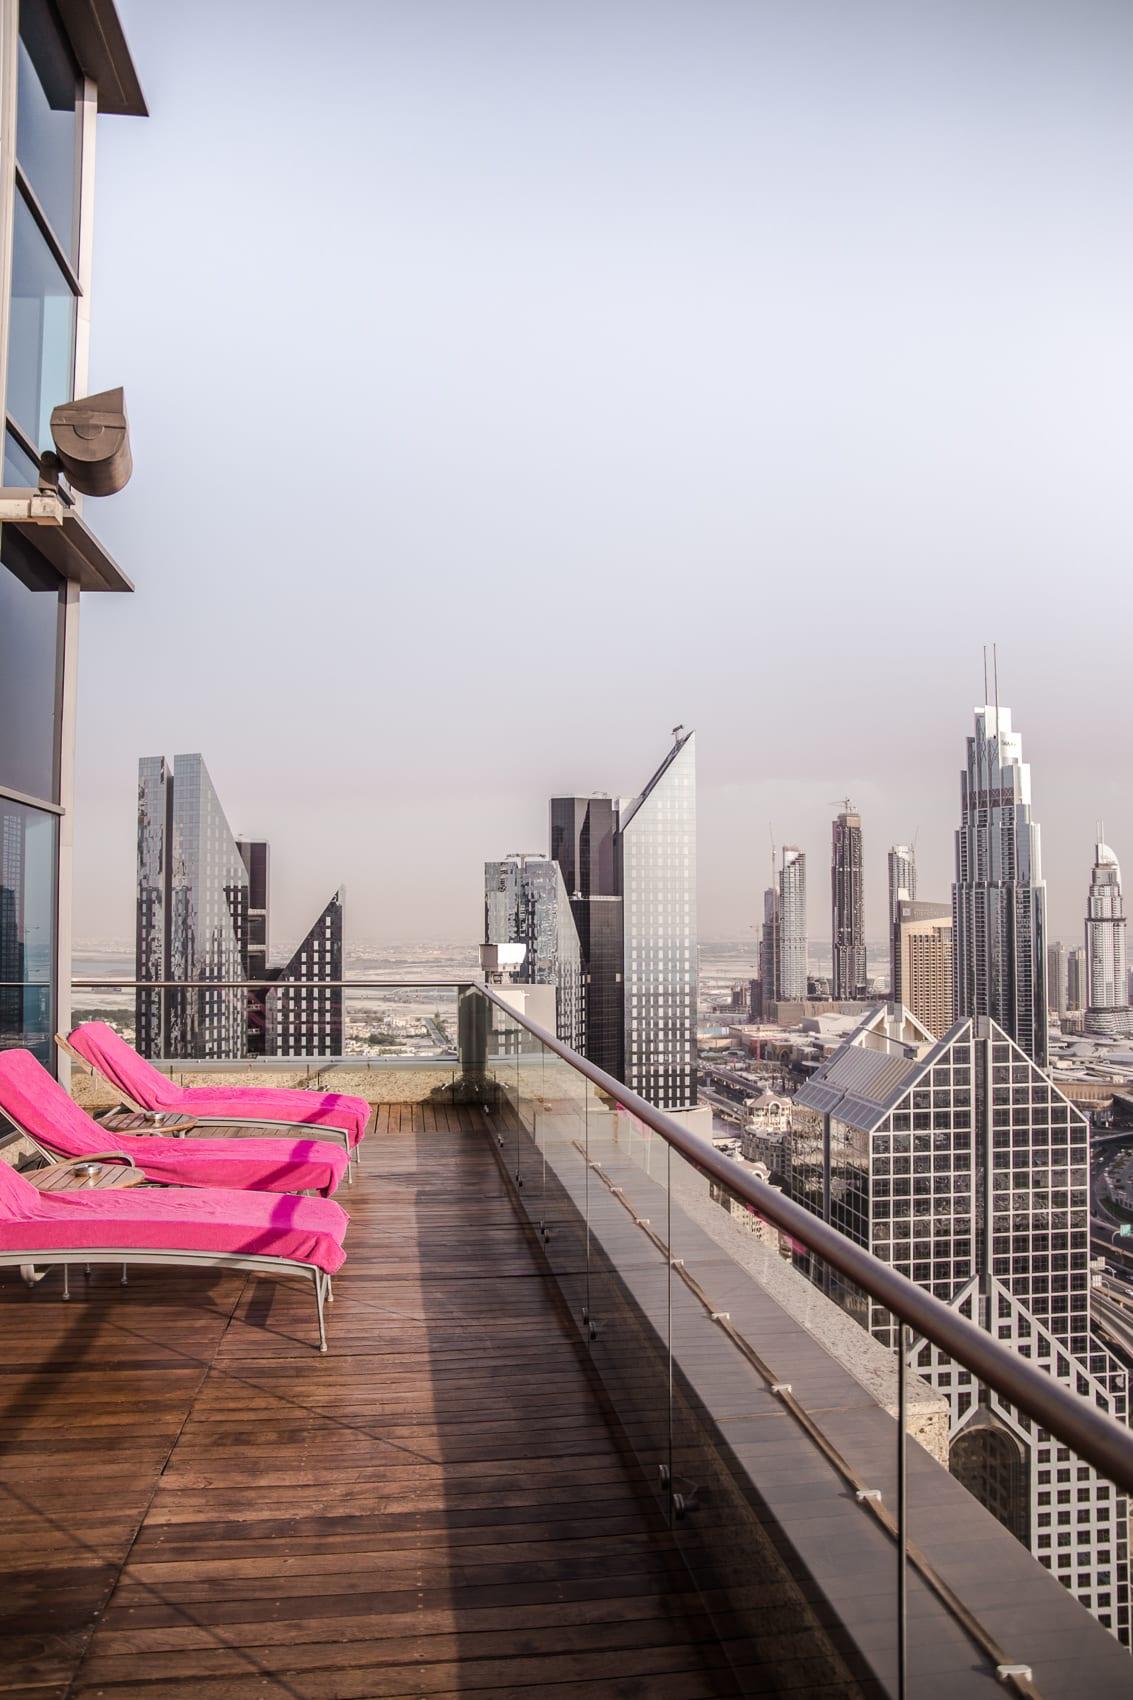 luxushotel-shangri-la-dubai-zimmer-pool-mit-blick-auf-den-burj-khalifa-reiseblog-des-belles-choses 36